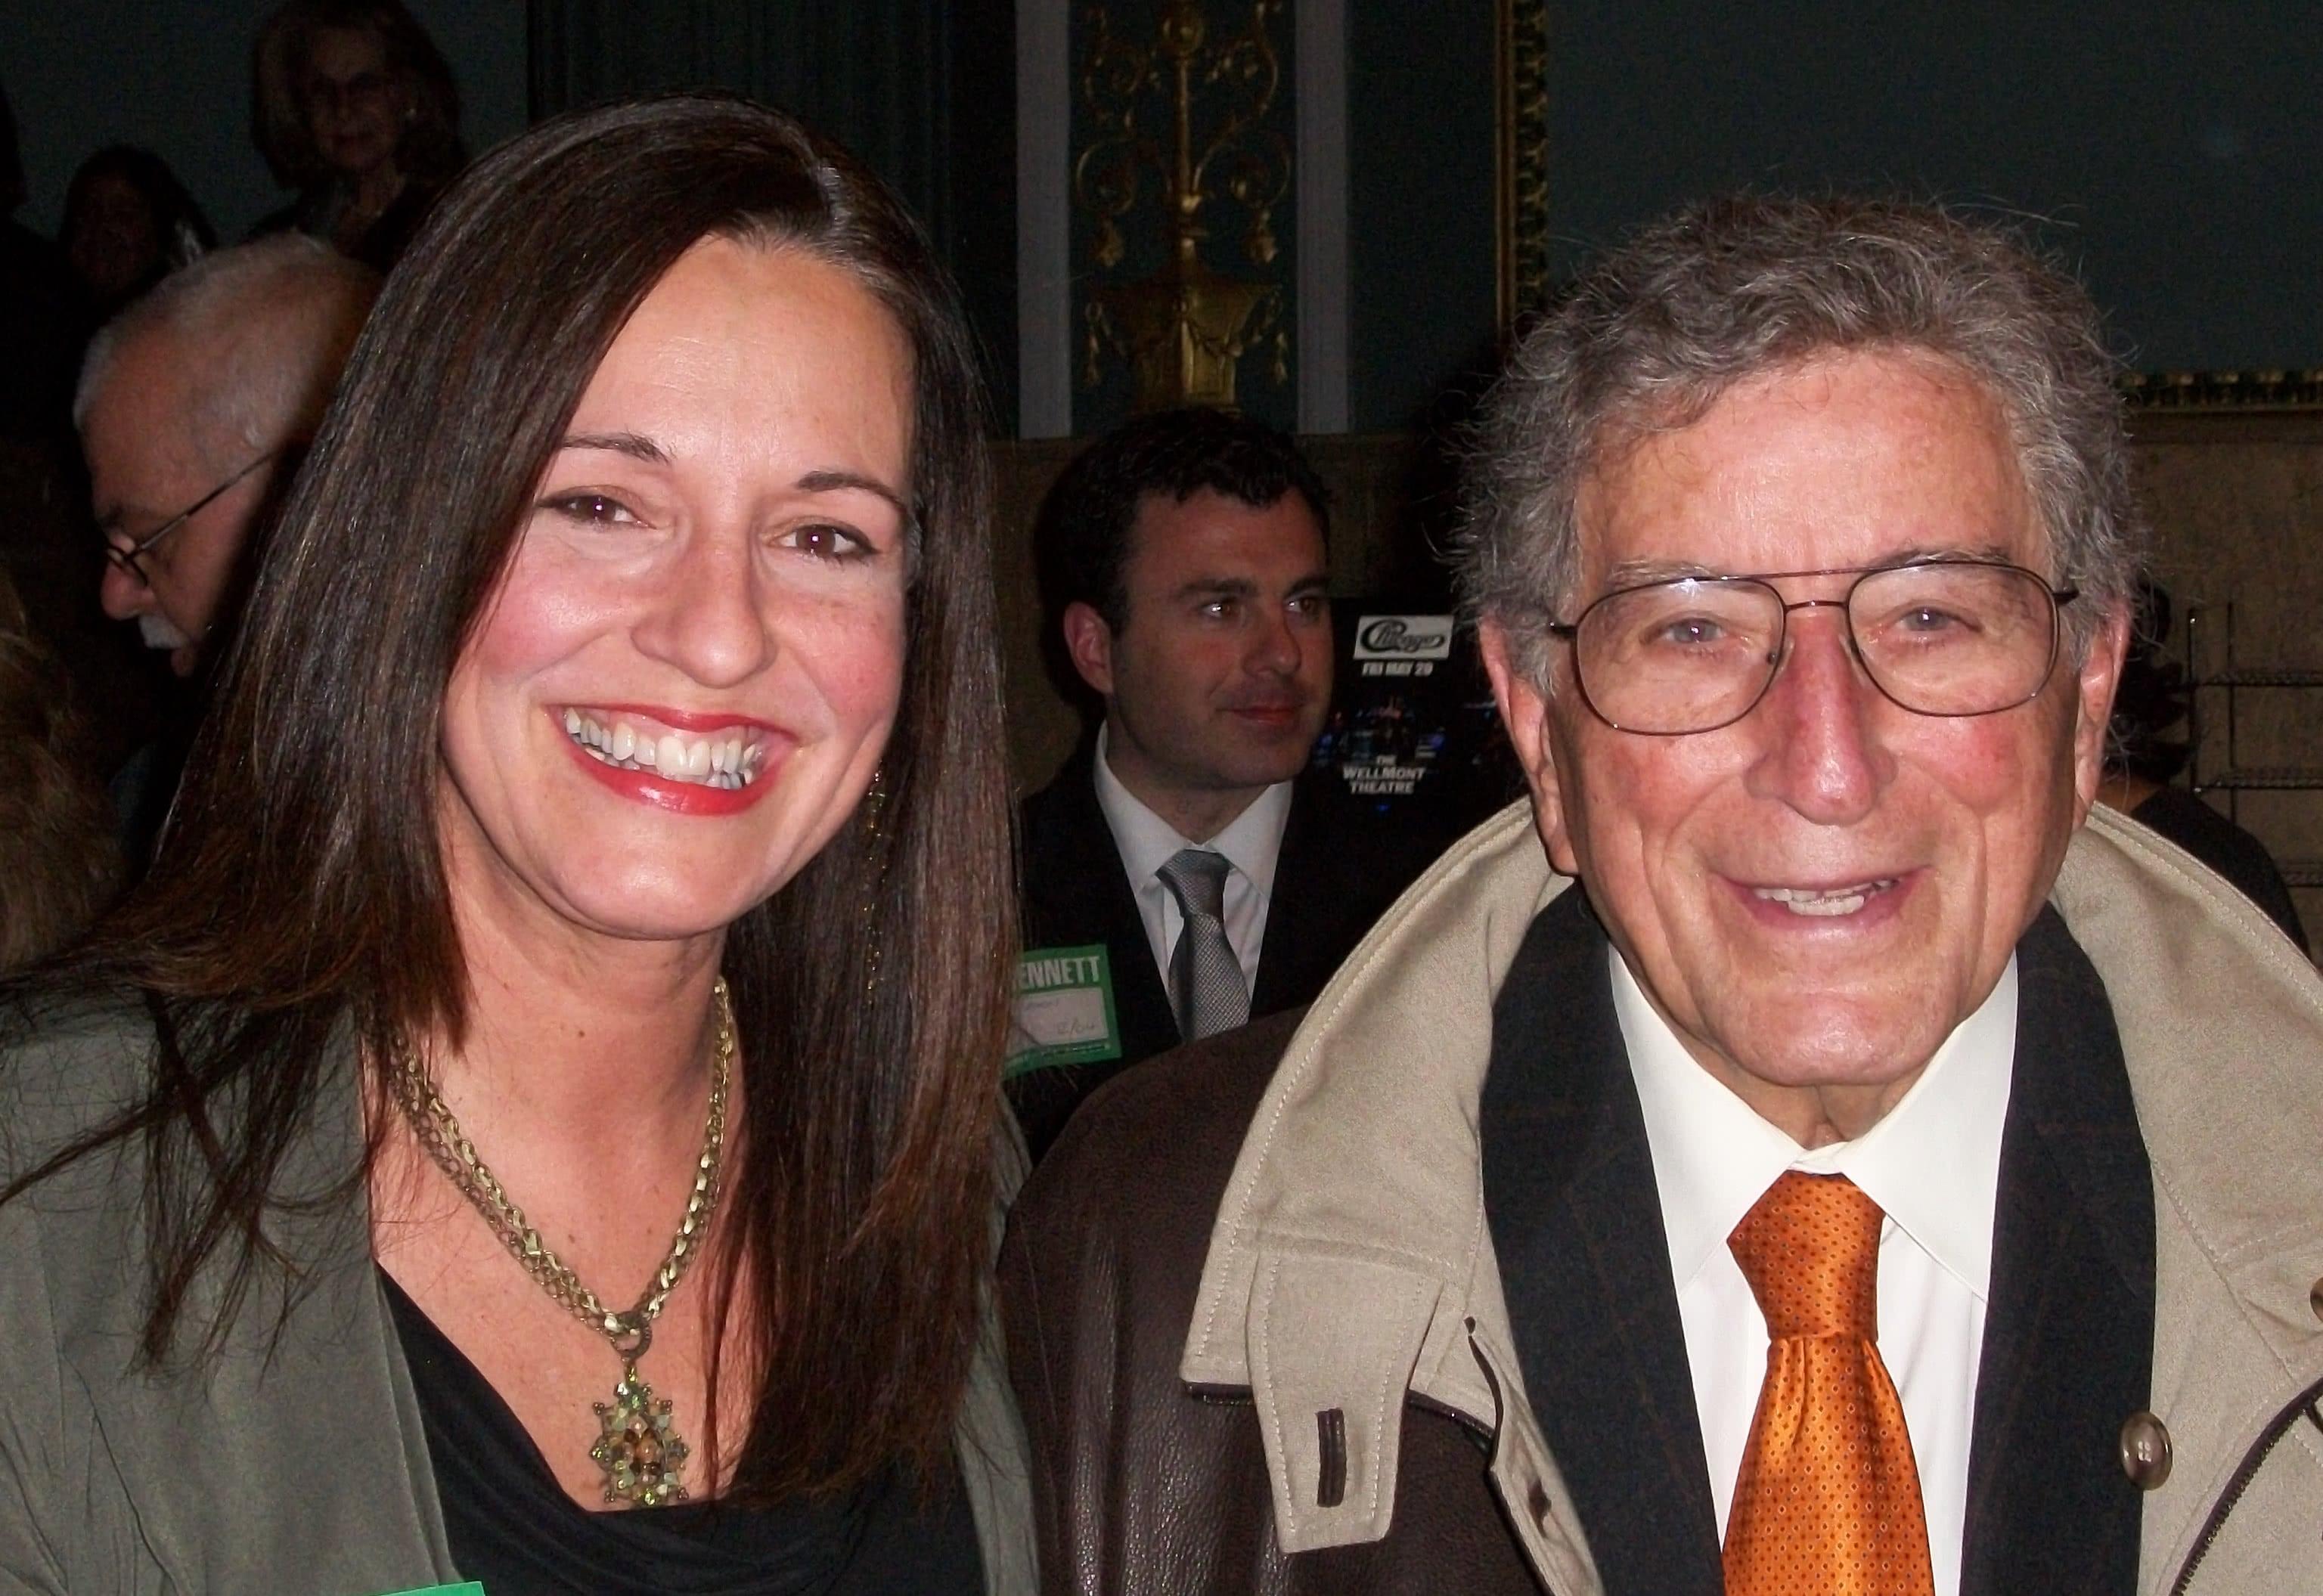 Debbie Major and Tony Bennett